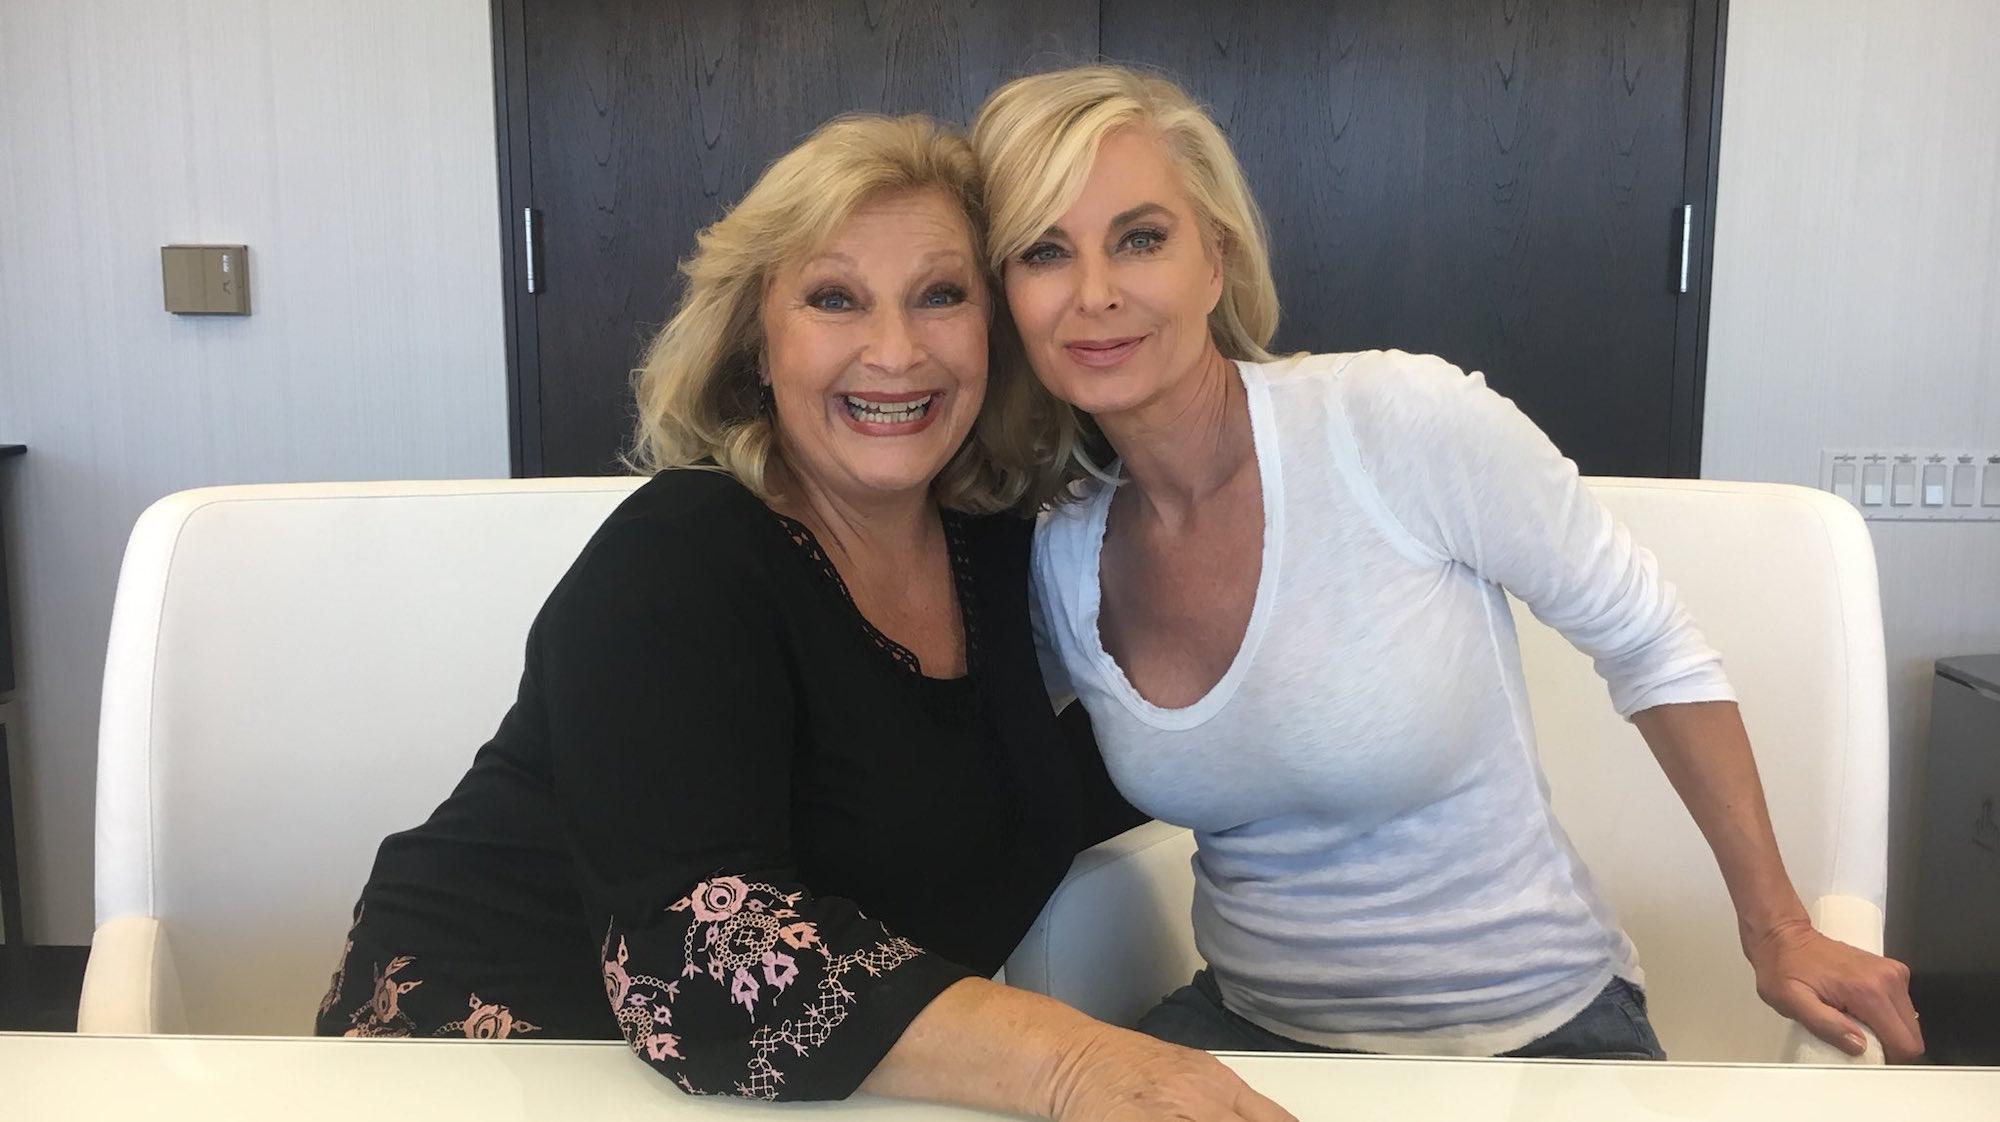 Beth Maitland and Eileen Davidson - Twitter